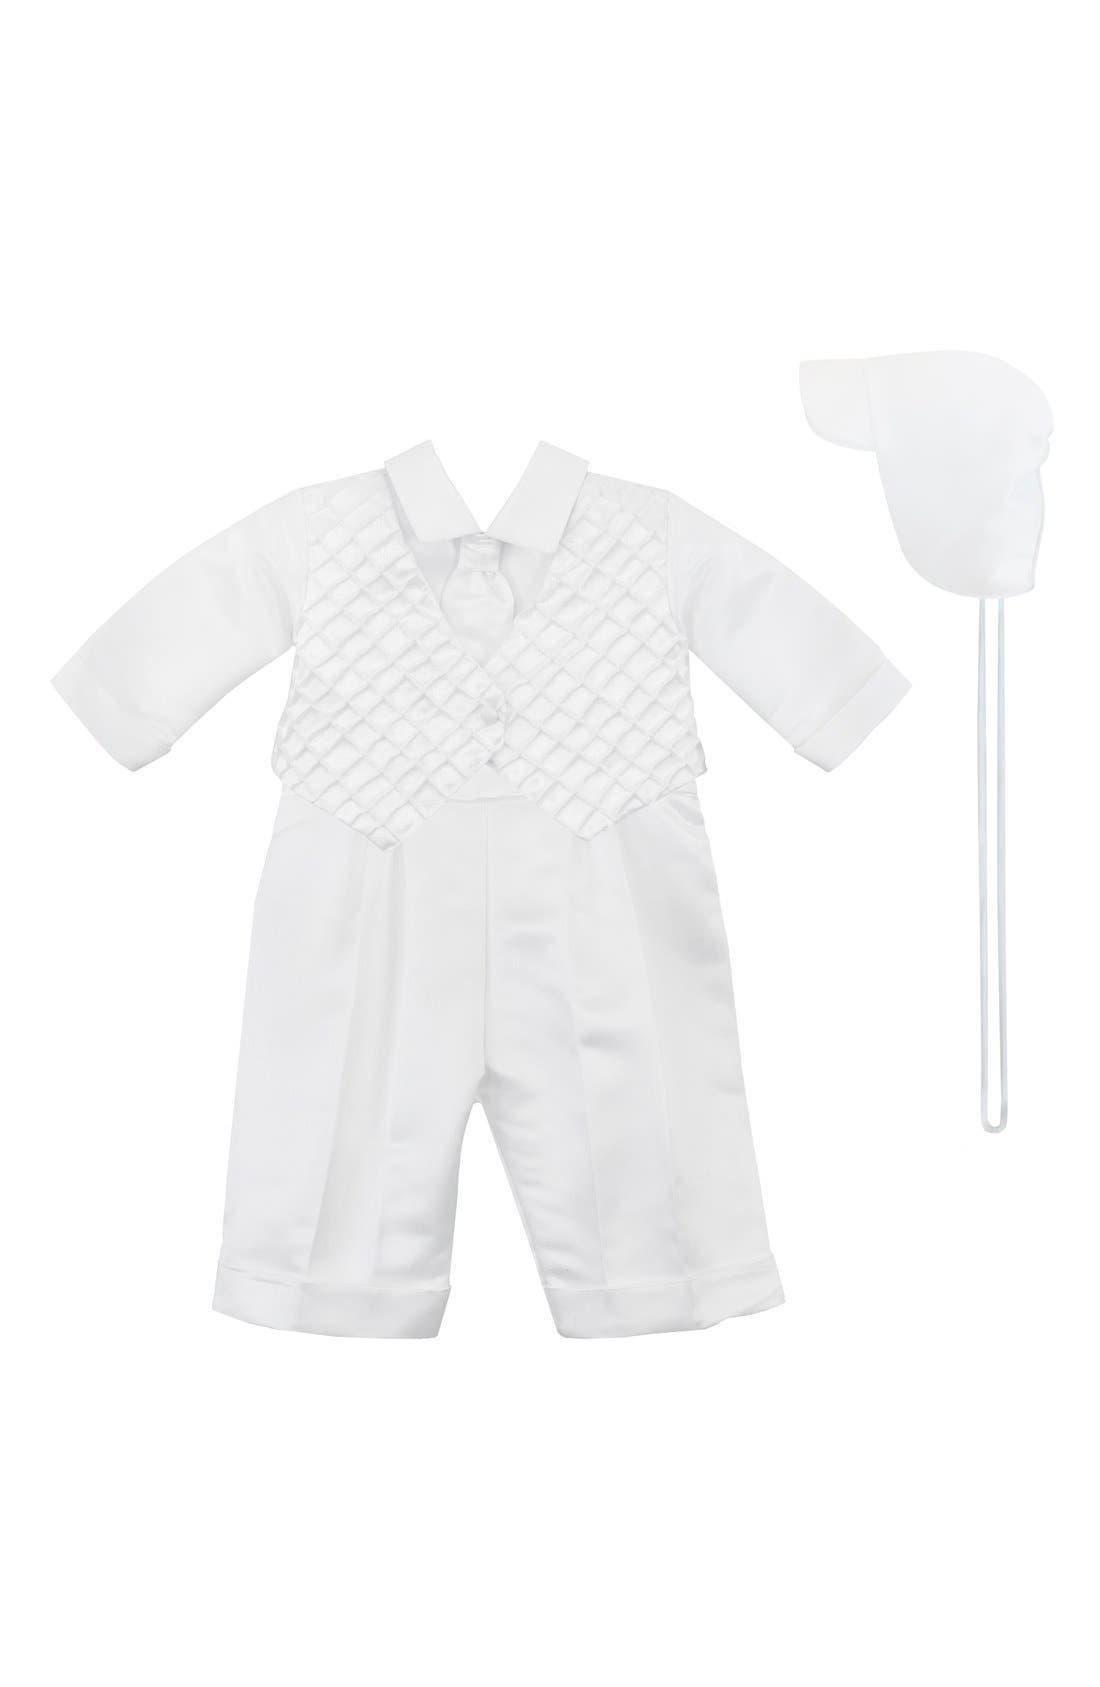 C.I. CASTRO & CO., Christening Shirt, Pants & Hat, Main thumbnail 1, color, WHITE